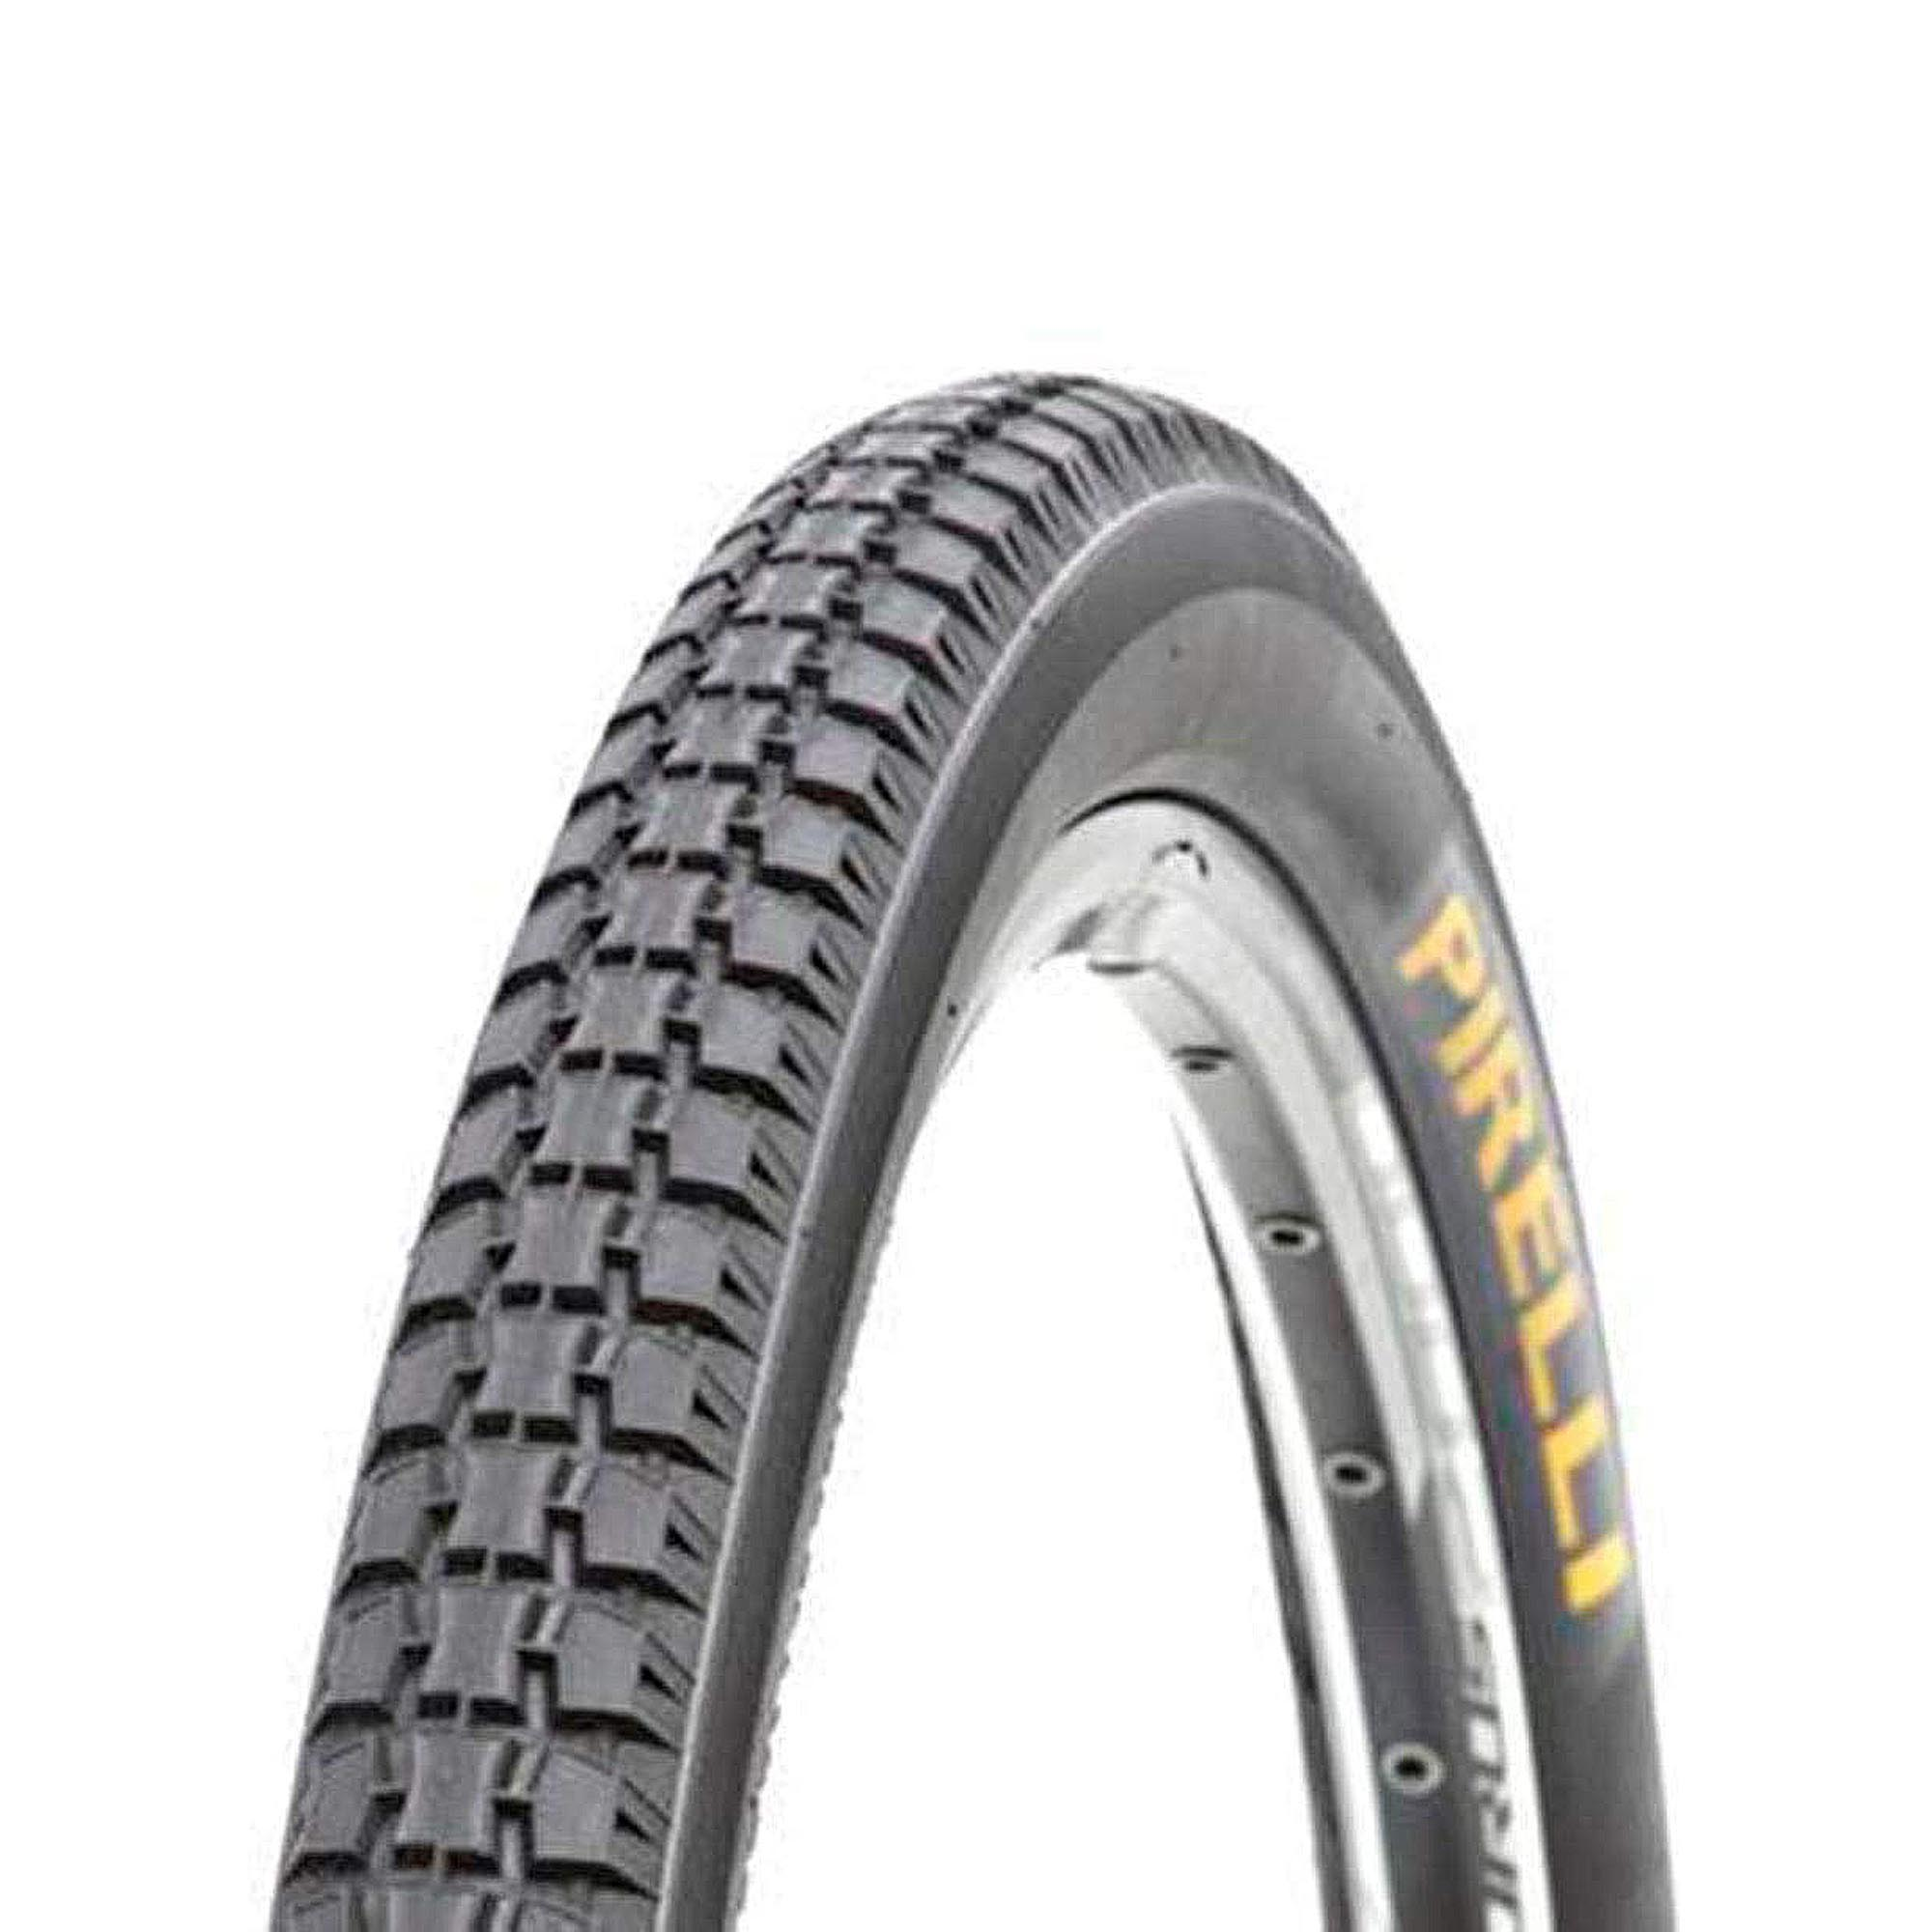 Pneu de Bicicleta Aro 26 Pirelli 1/2 X 2 Primor